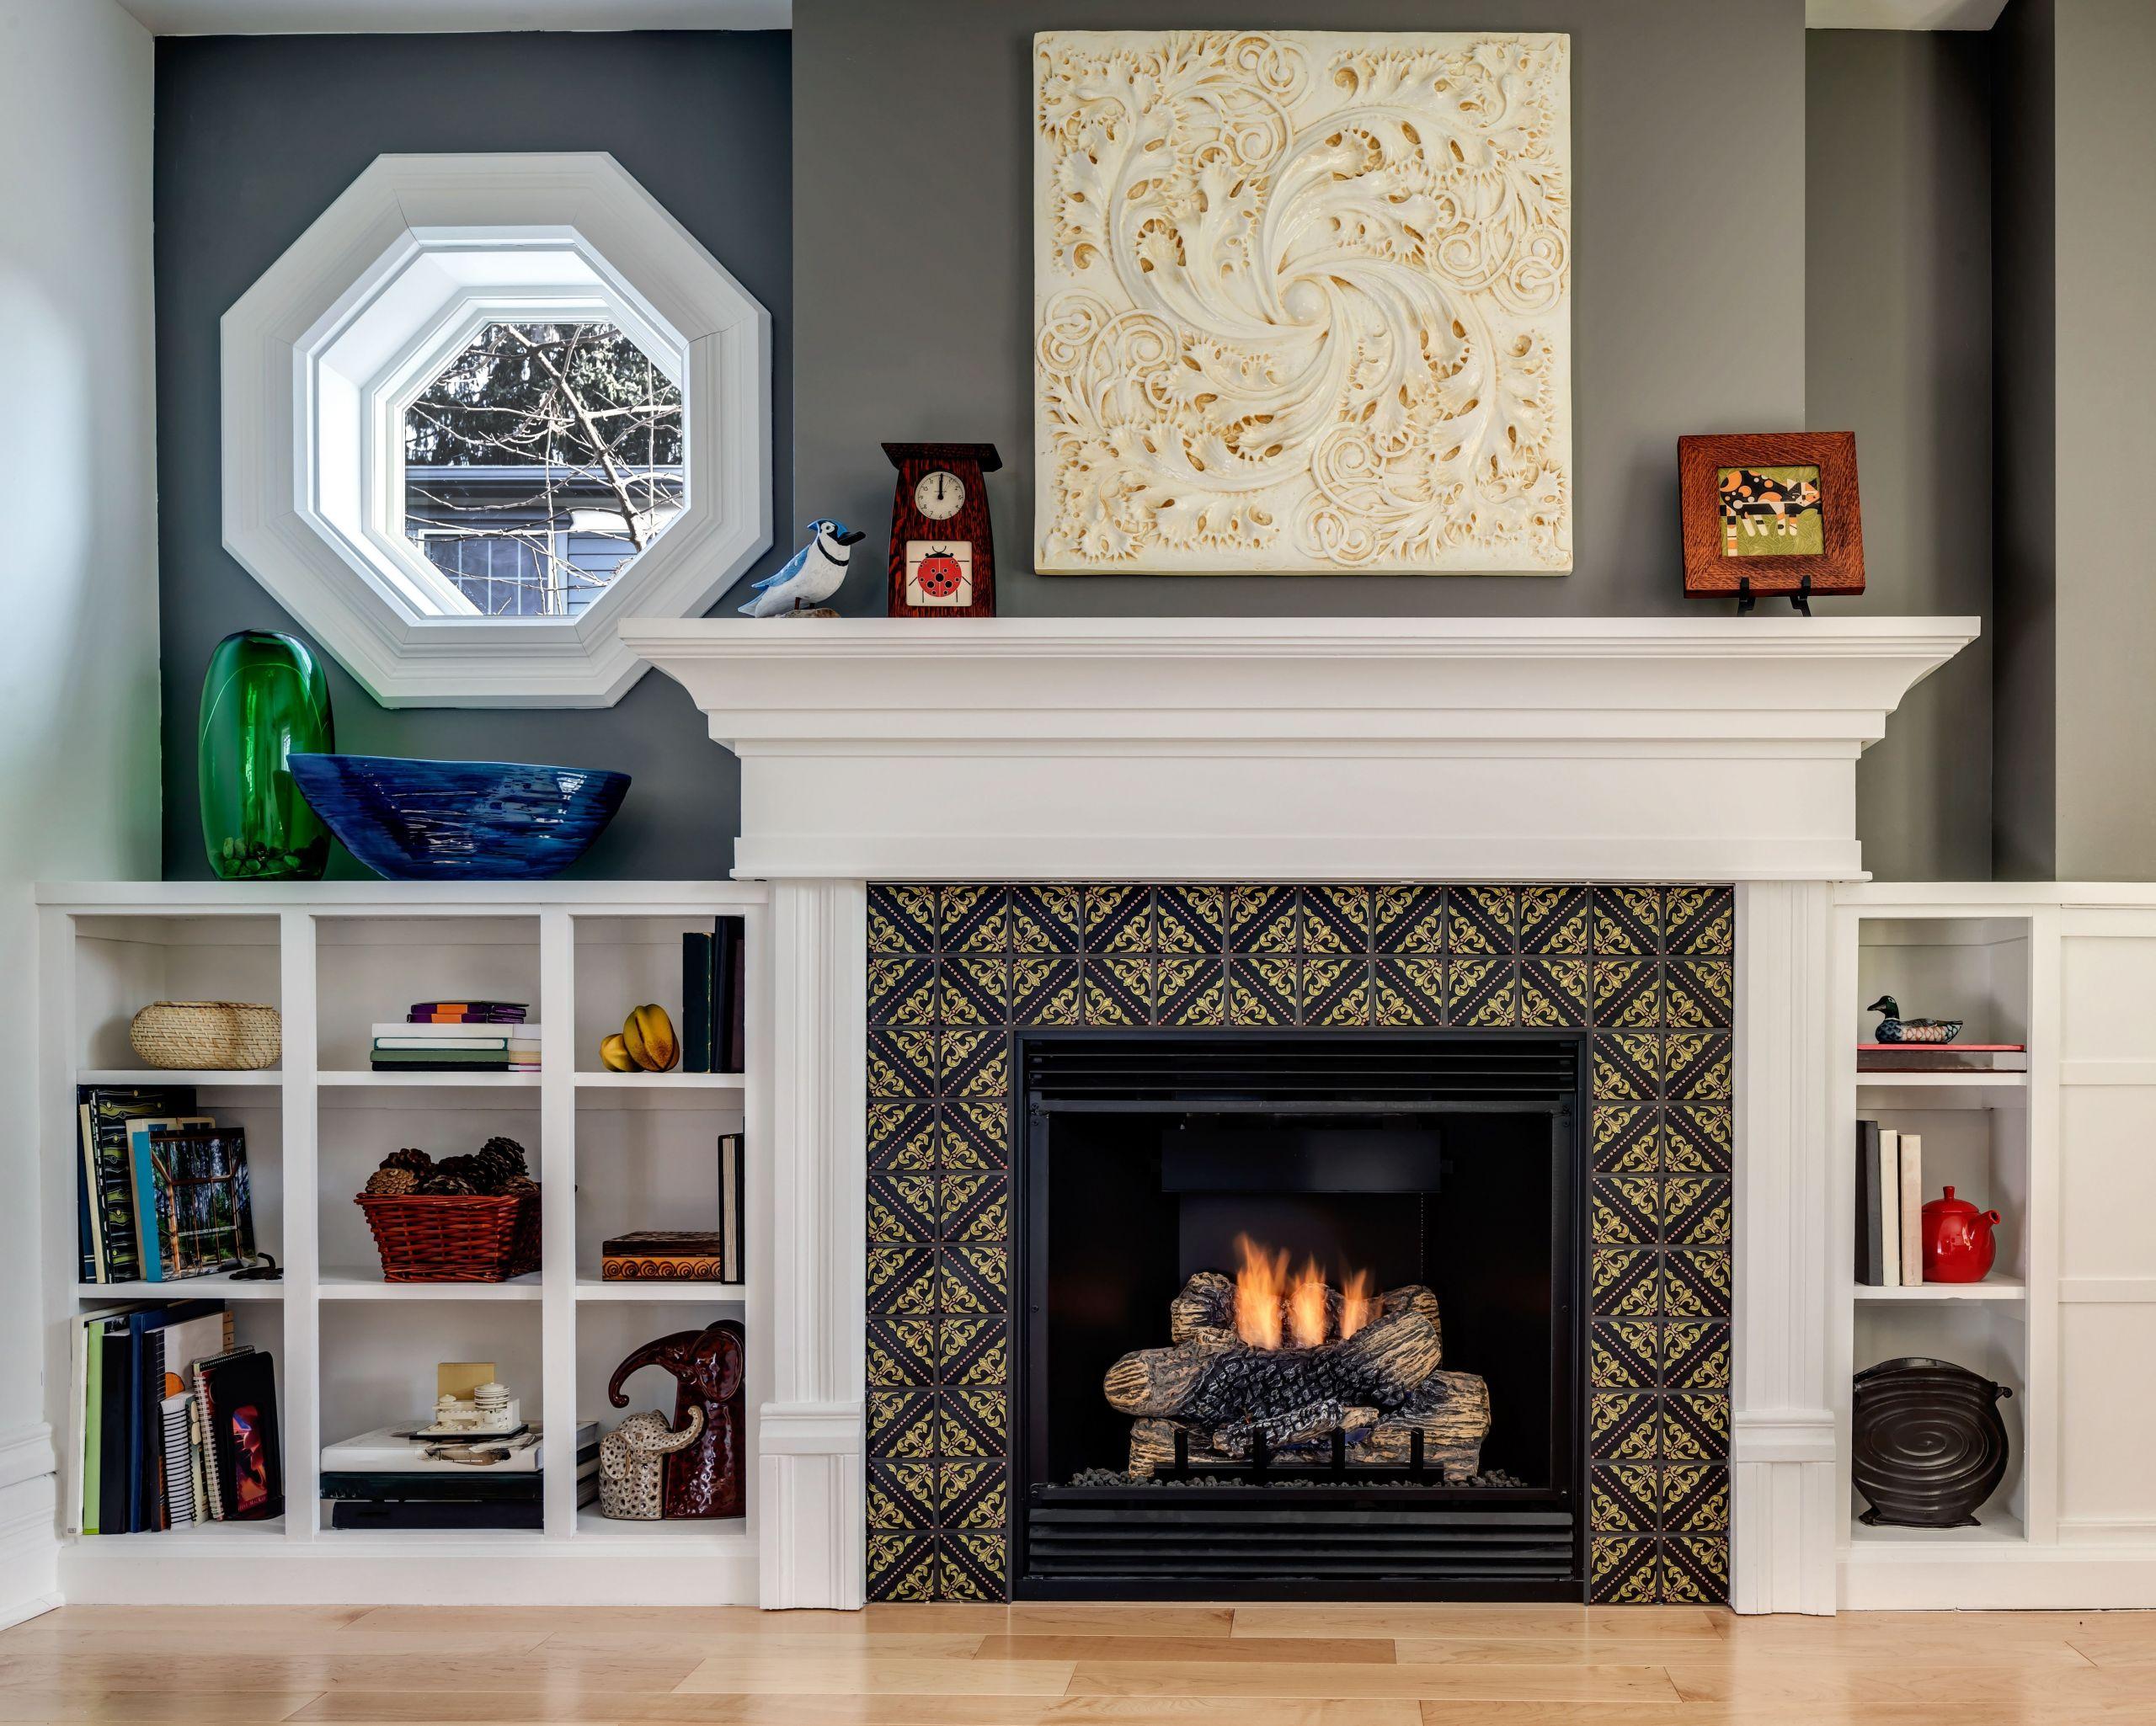 Fireplace Backsplash Ideas Elegant This Small but Stylish Fireplace Features Our Lisbon Tile